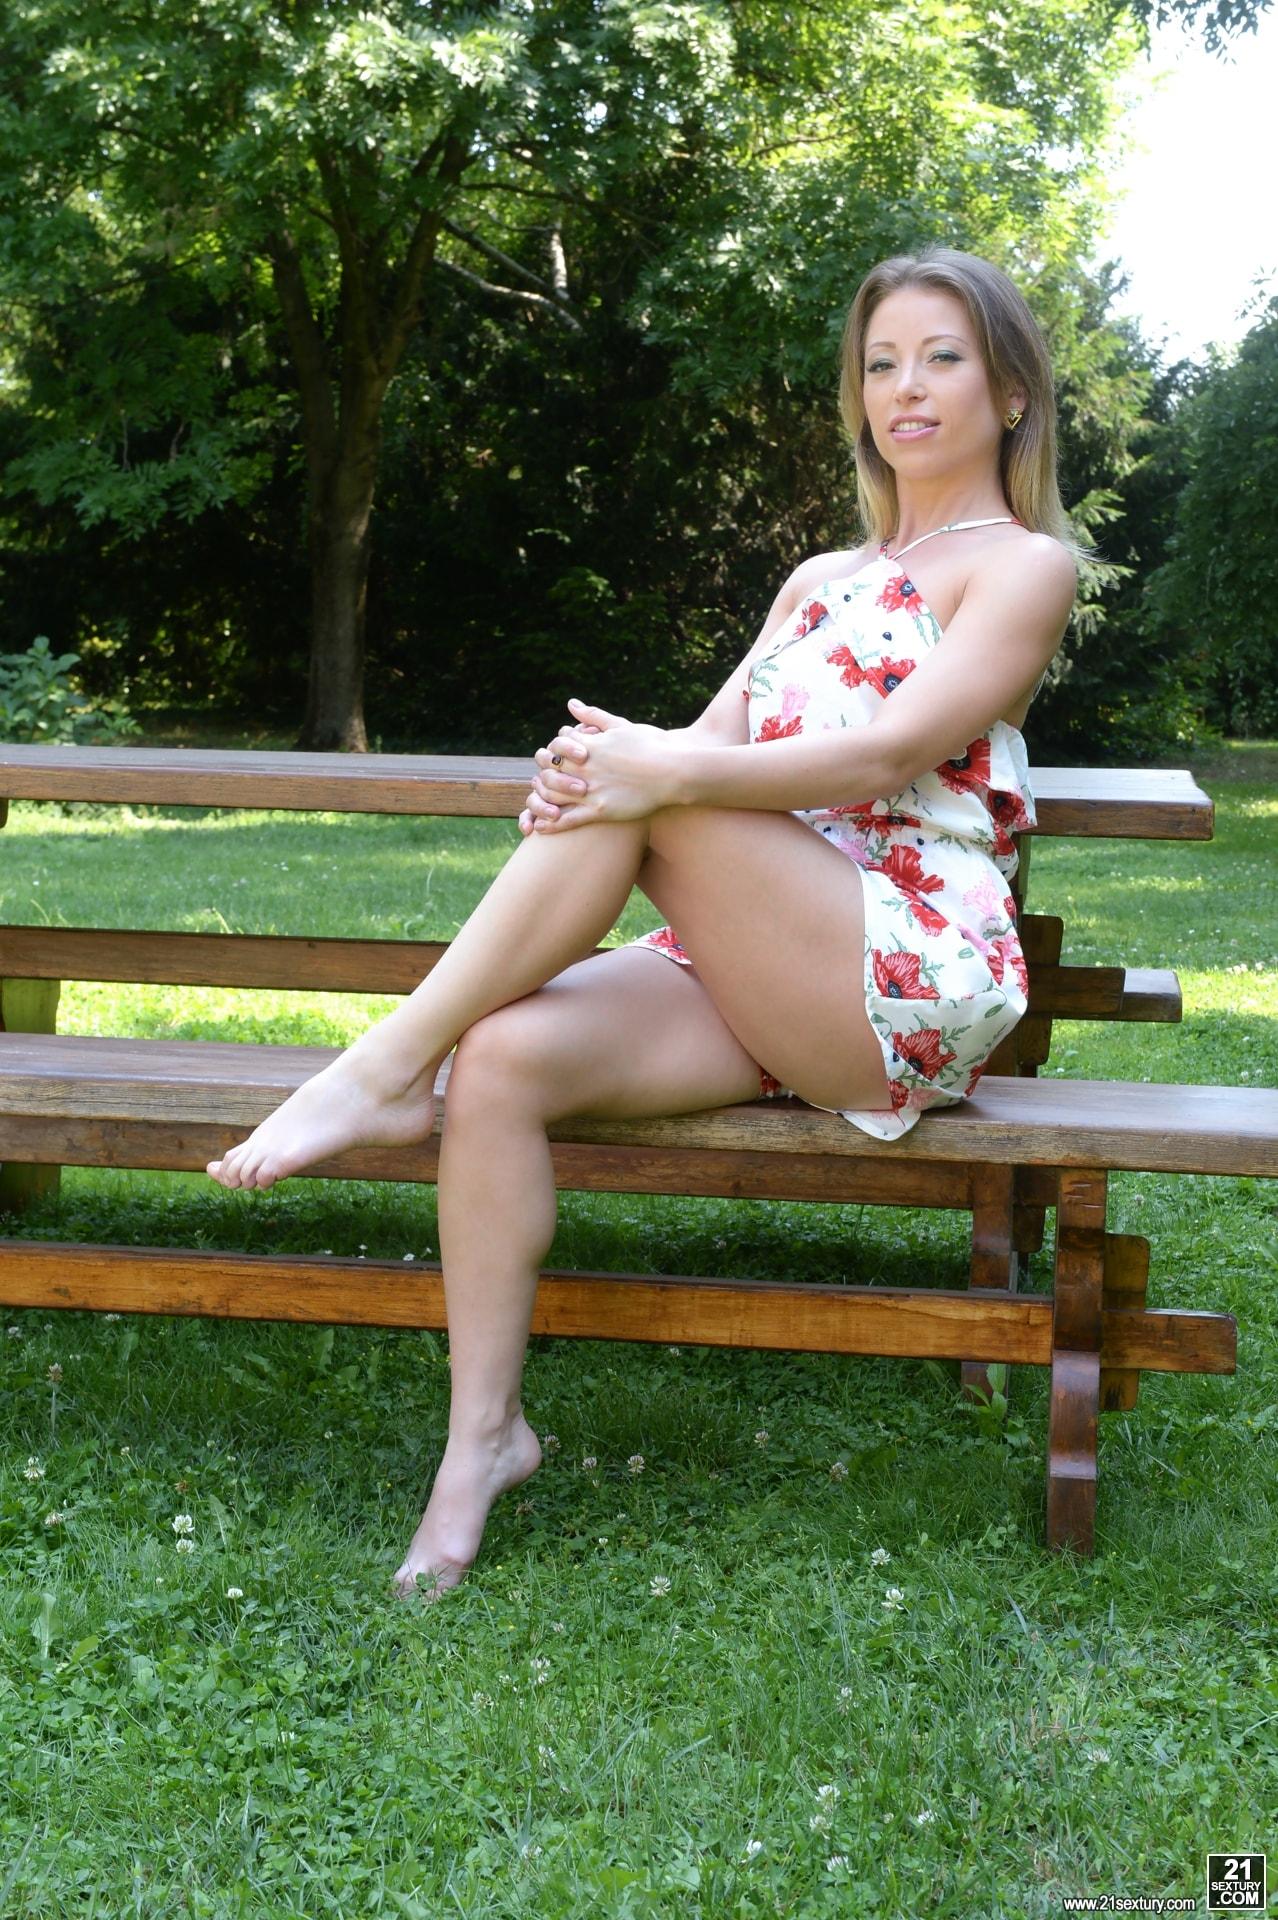 21Sextury 'Natural Flavour' starring Vera Wonder (Photo 1)